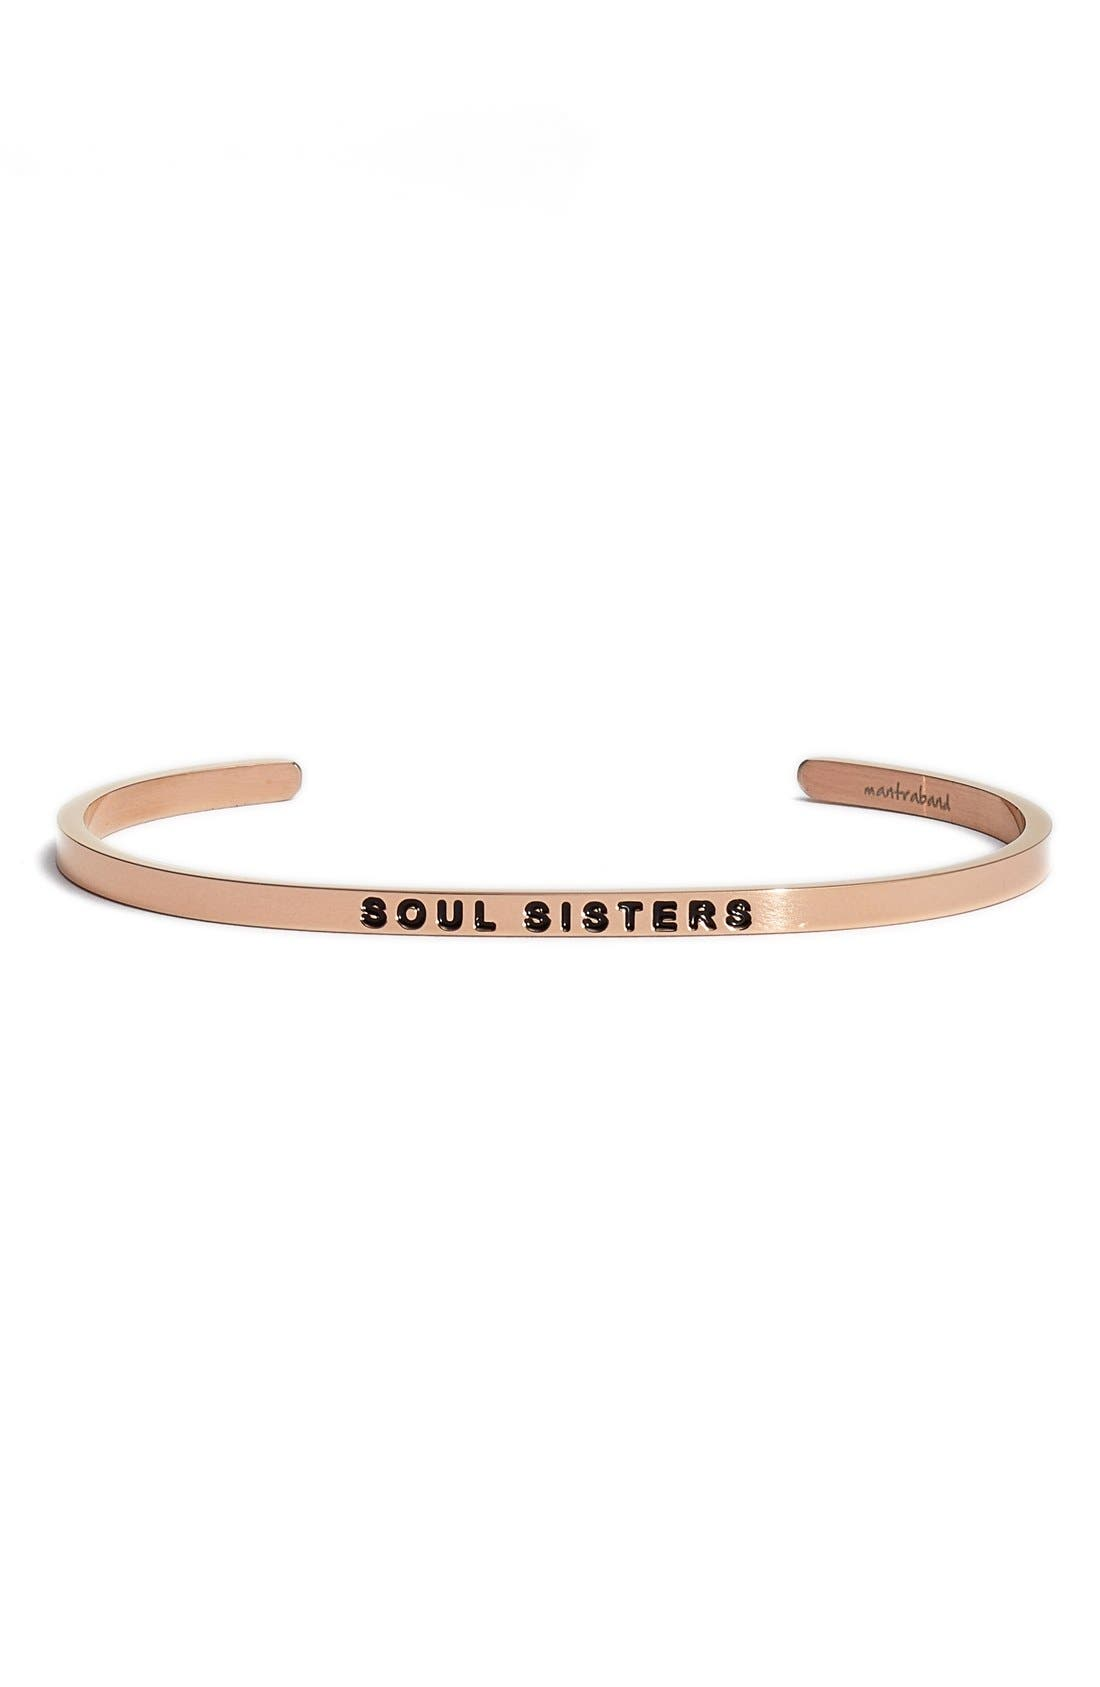 'Soul Sister' Cuff,                         Main,                         color, ROSEGOLD